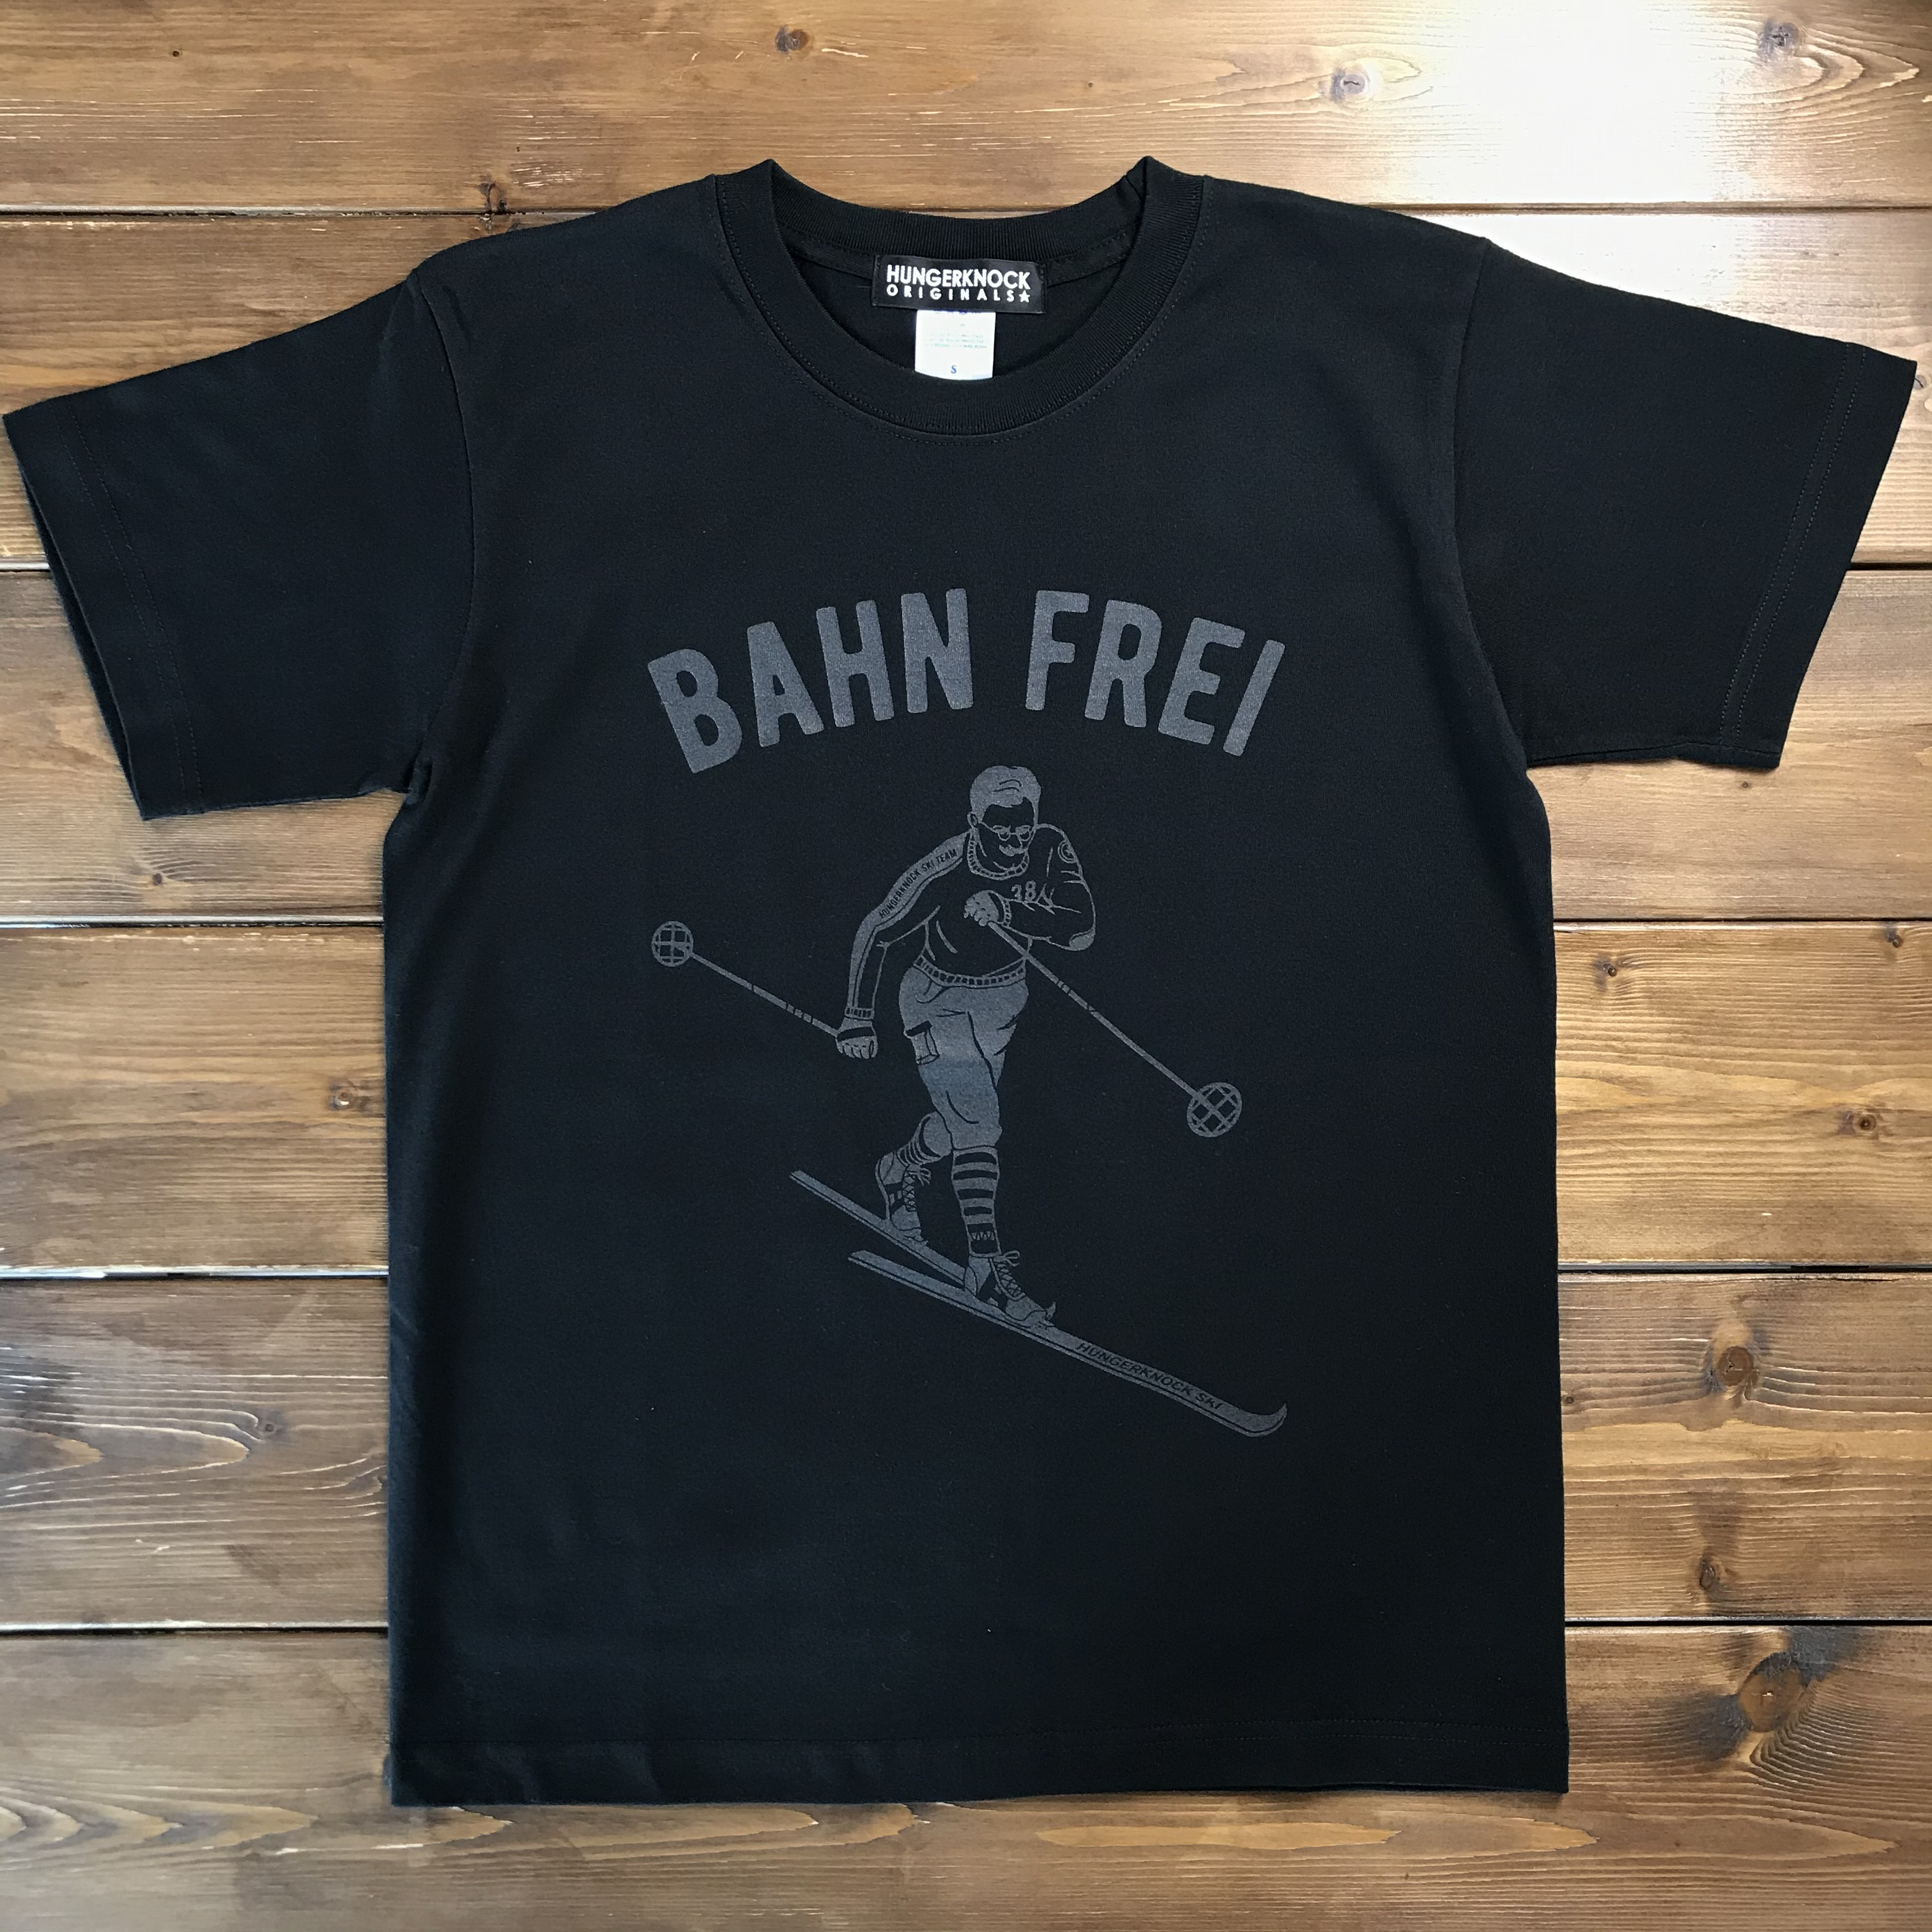 BAHN FREI Tee /black